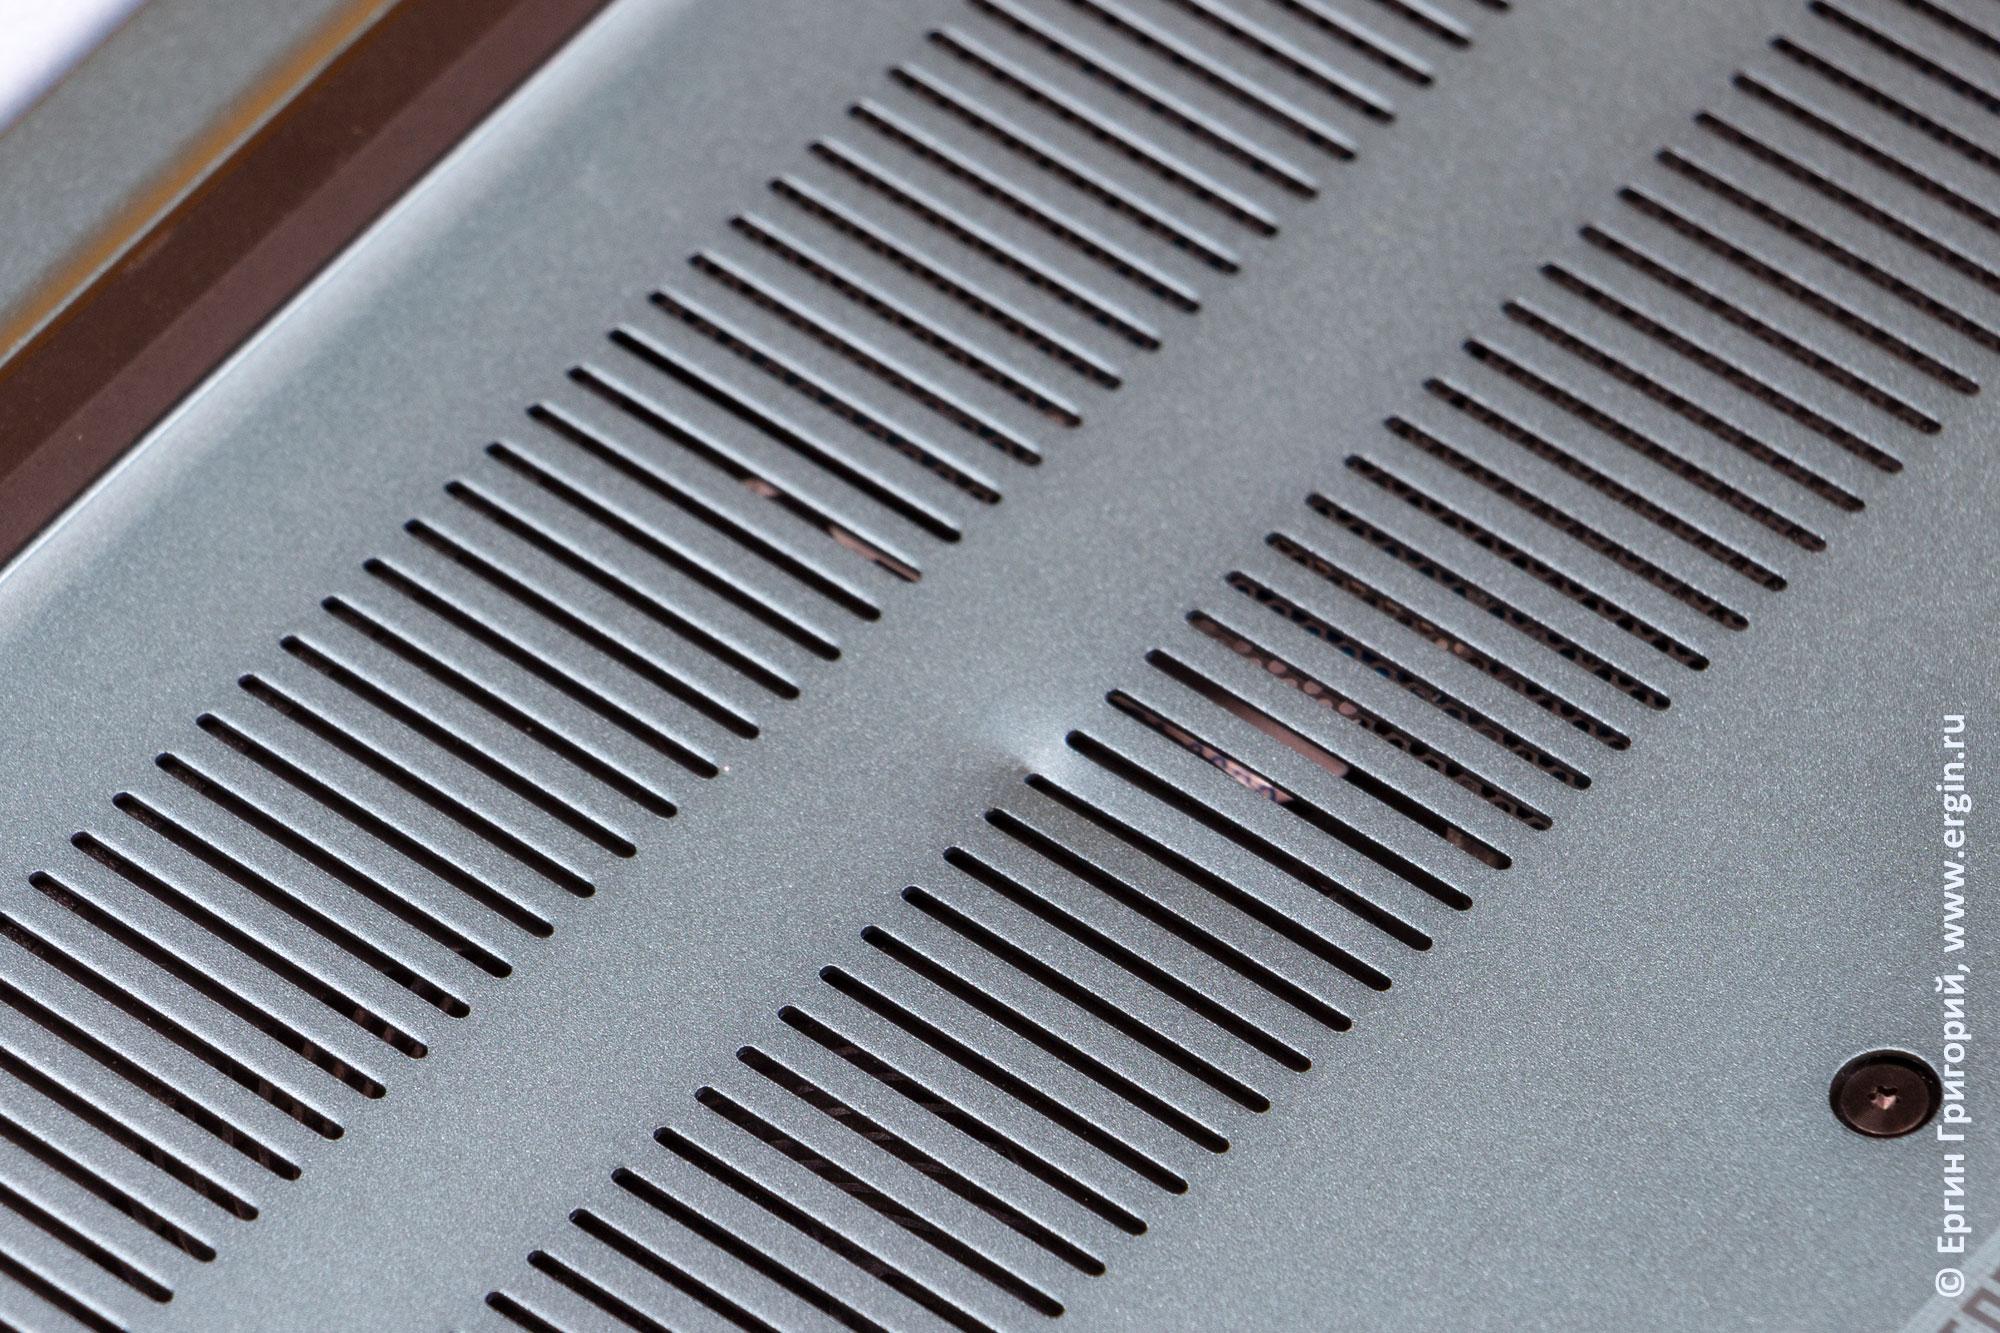 Вмятина на тонком аллюминиевом корпусе ноутбука ACER Swift 3